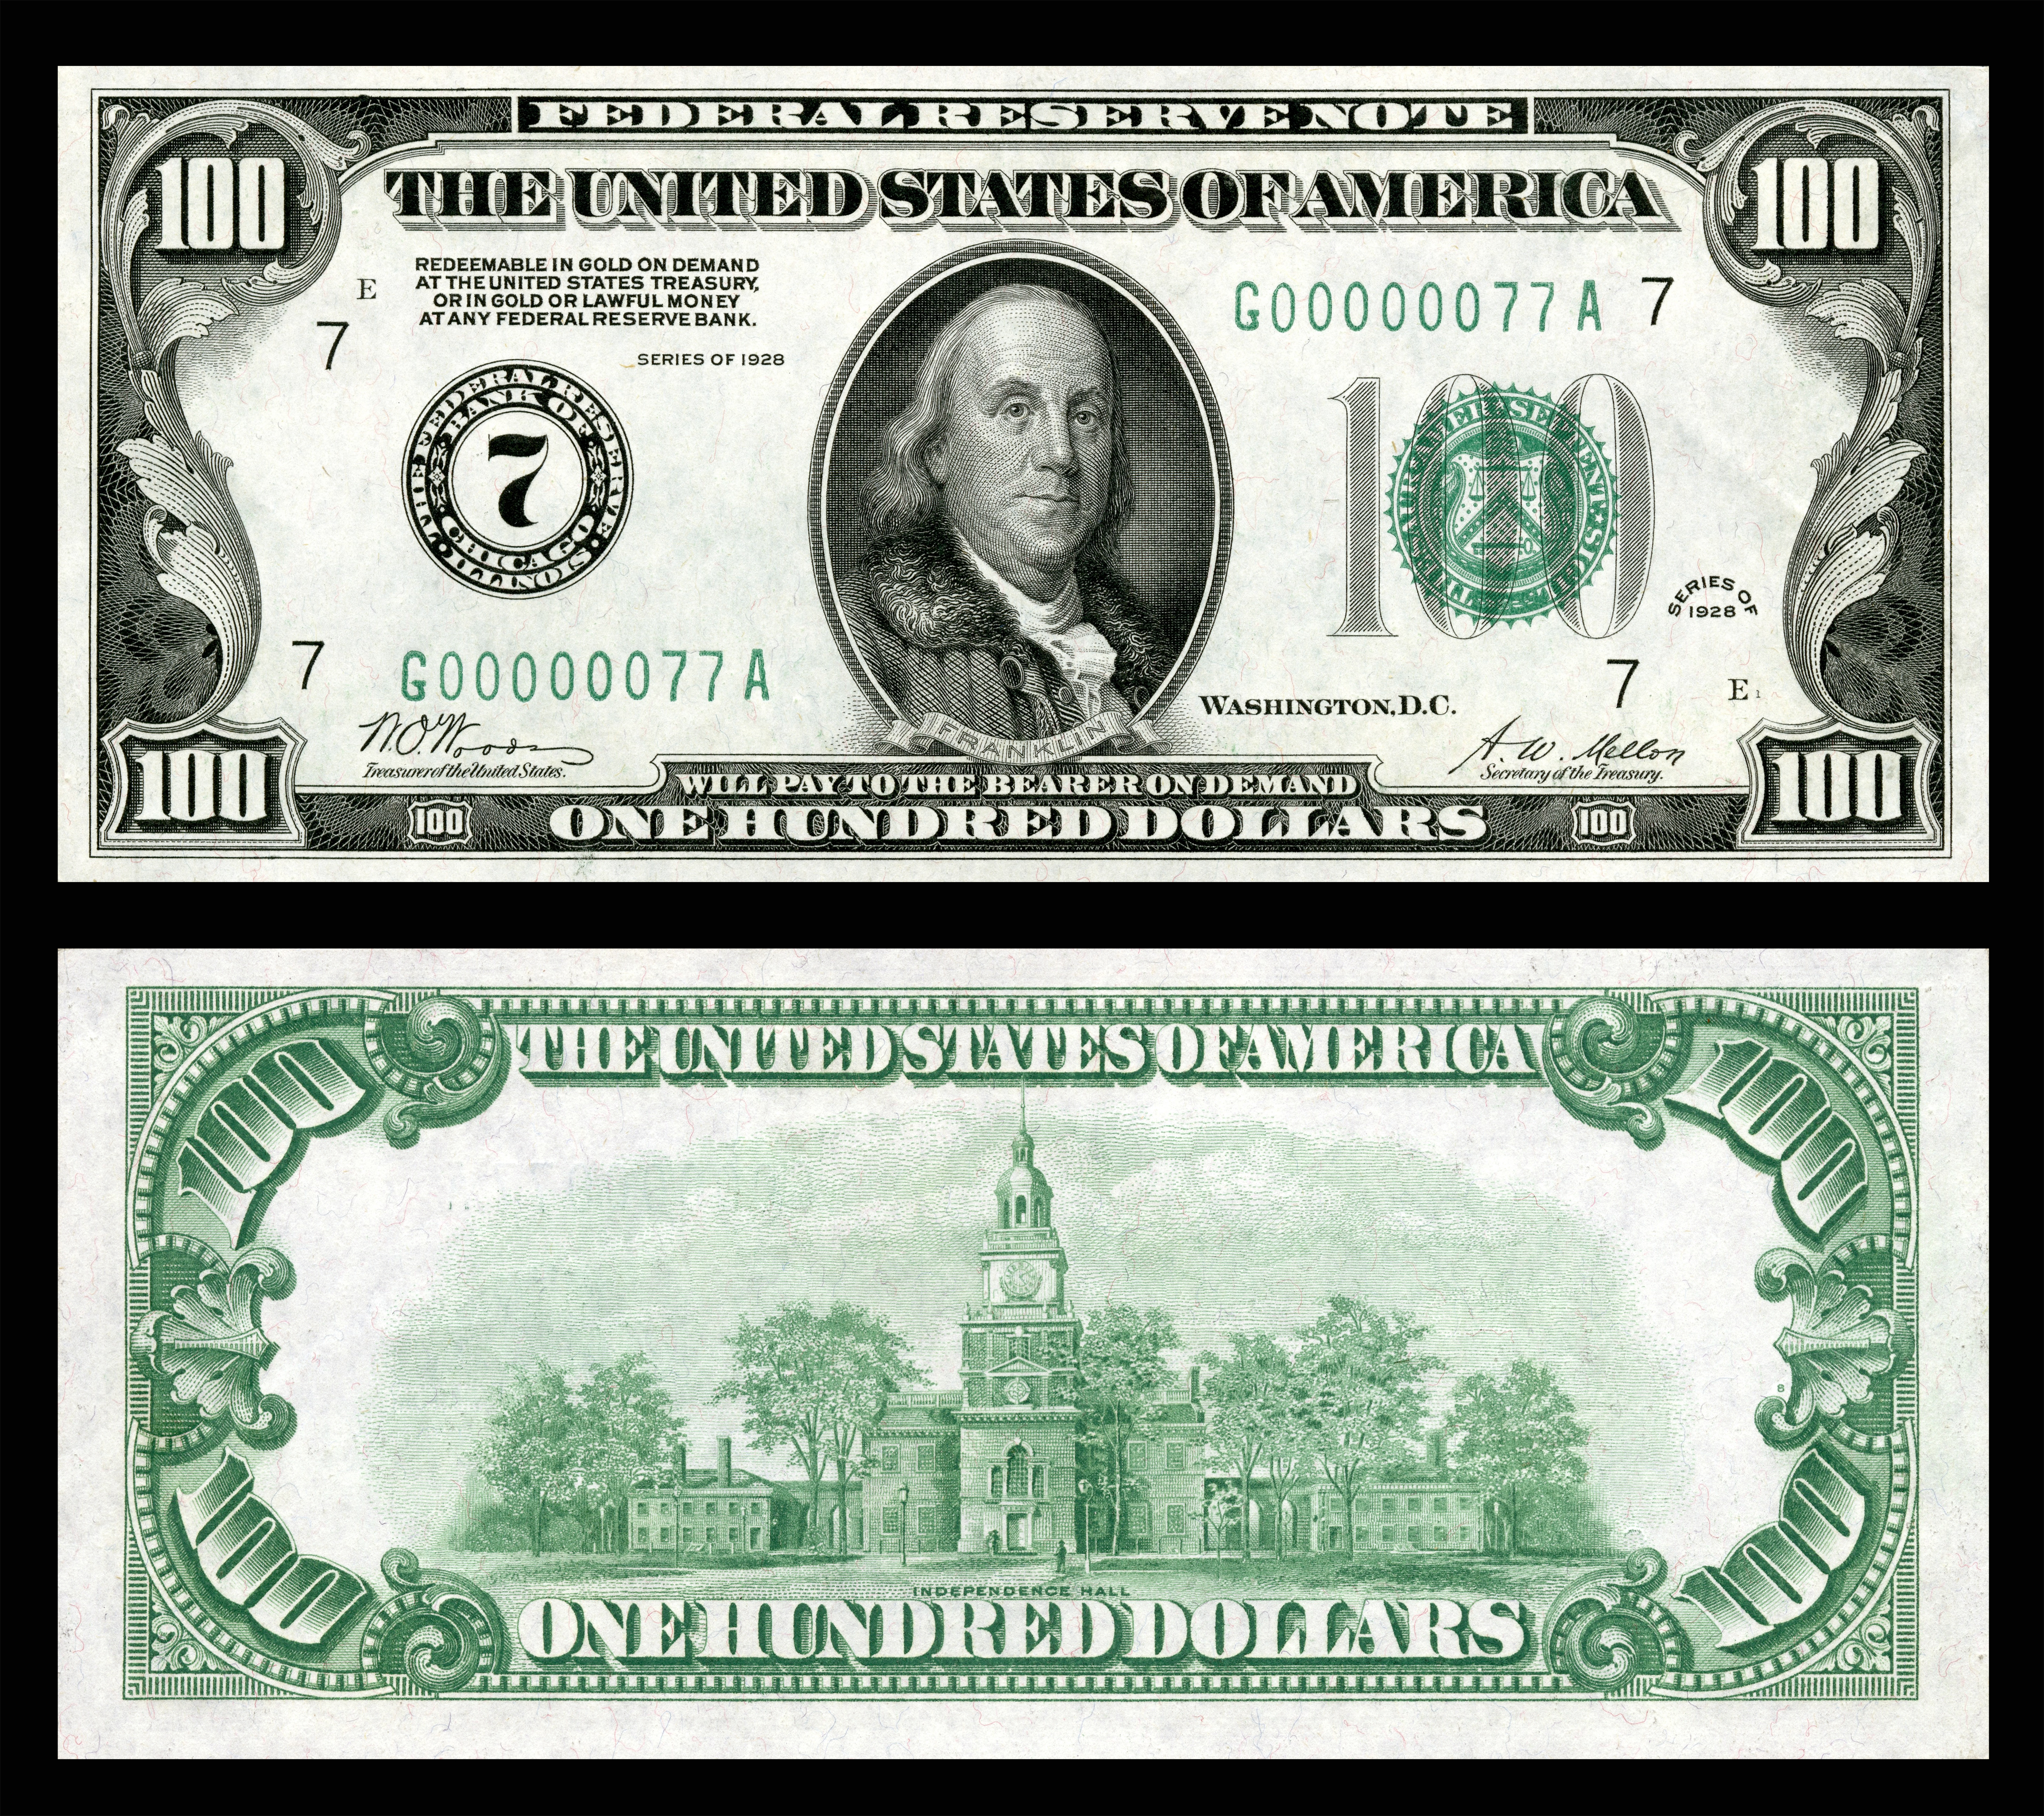 worksheet Dollar Bill Printable 100 dollar bill template 28 images custom by free template